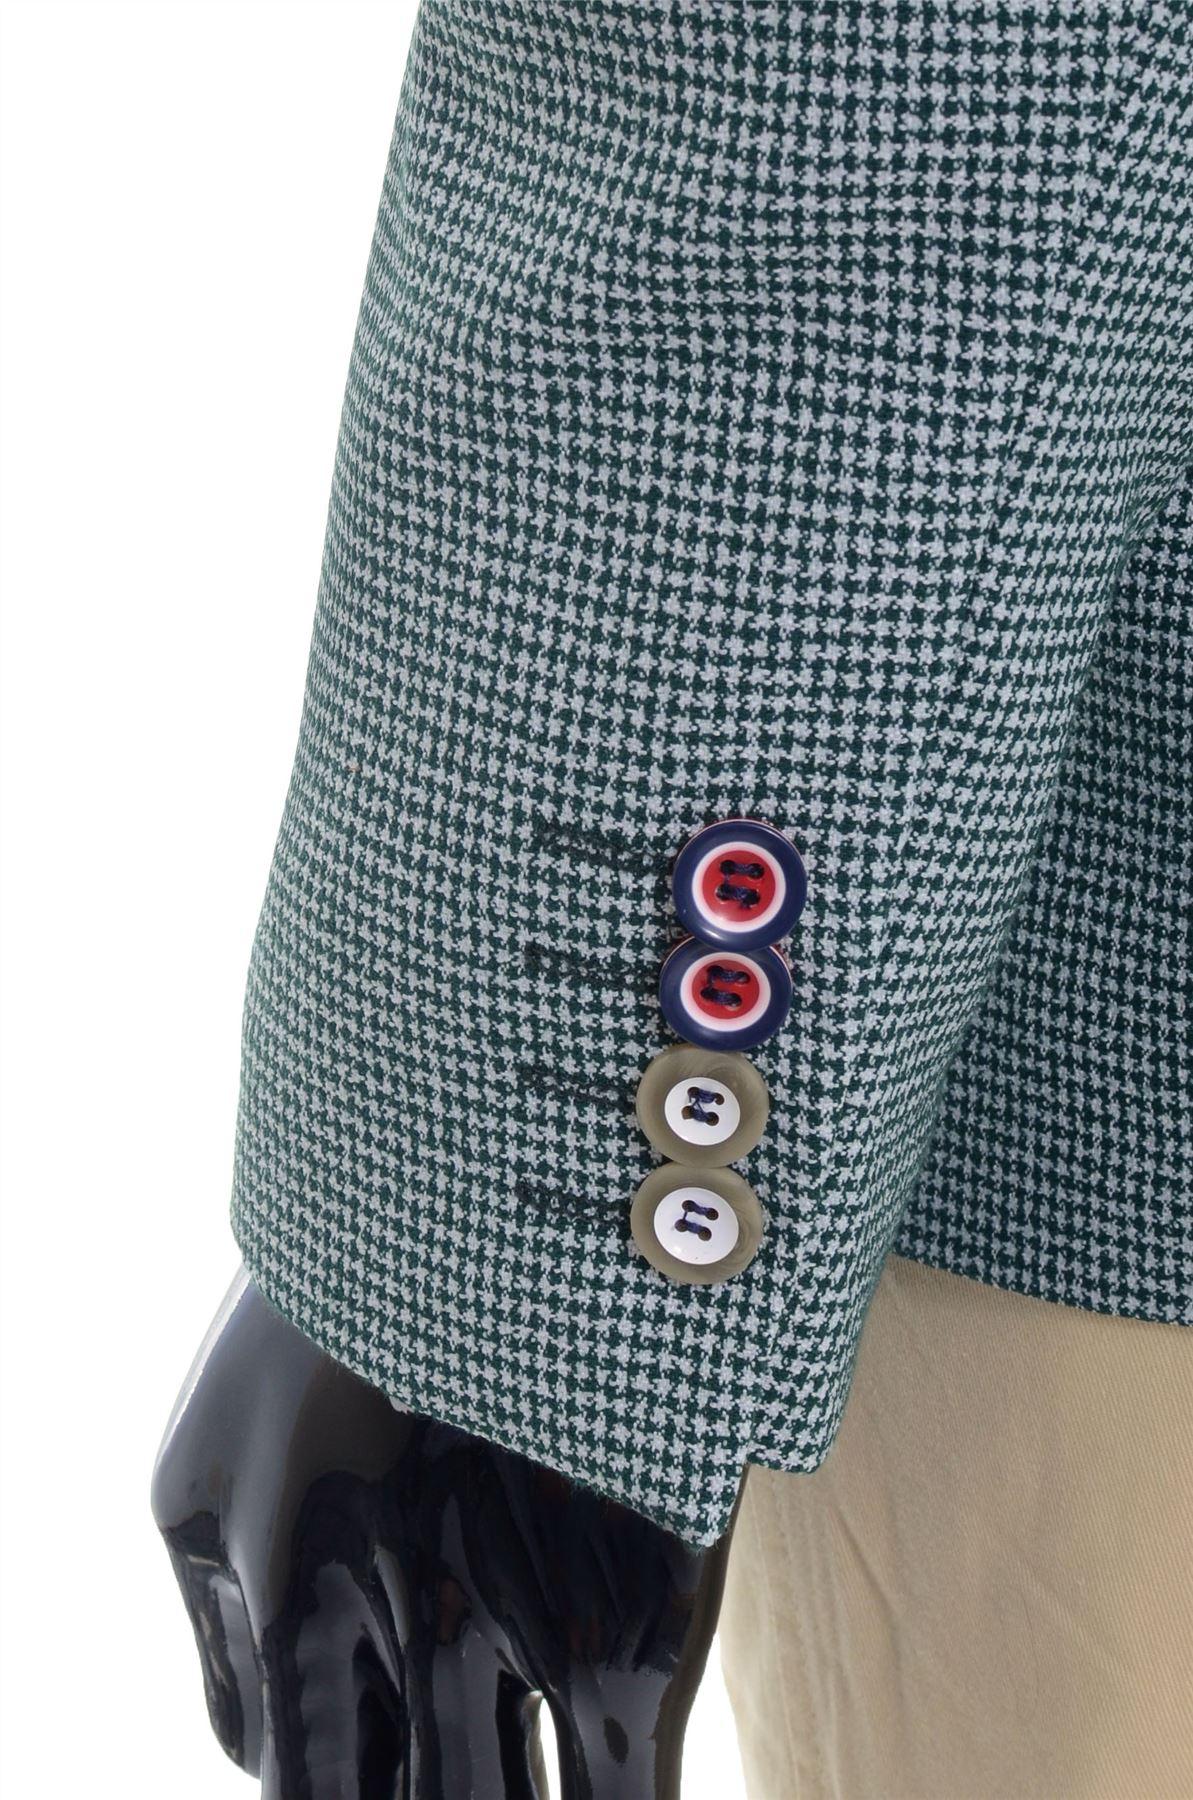 Men-039-s-Blazer-Jacket-Casual-Formal-Herringbone-Check-UK-Size-Cotton-REGULAR-FIT